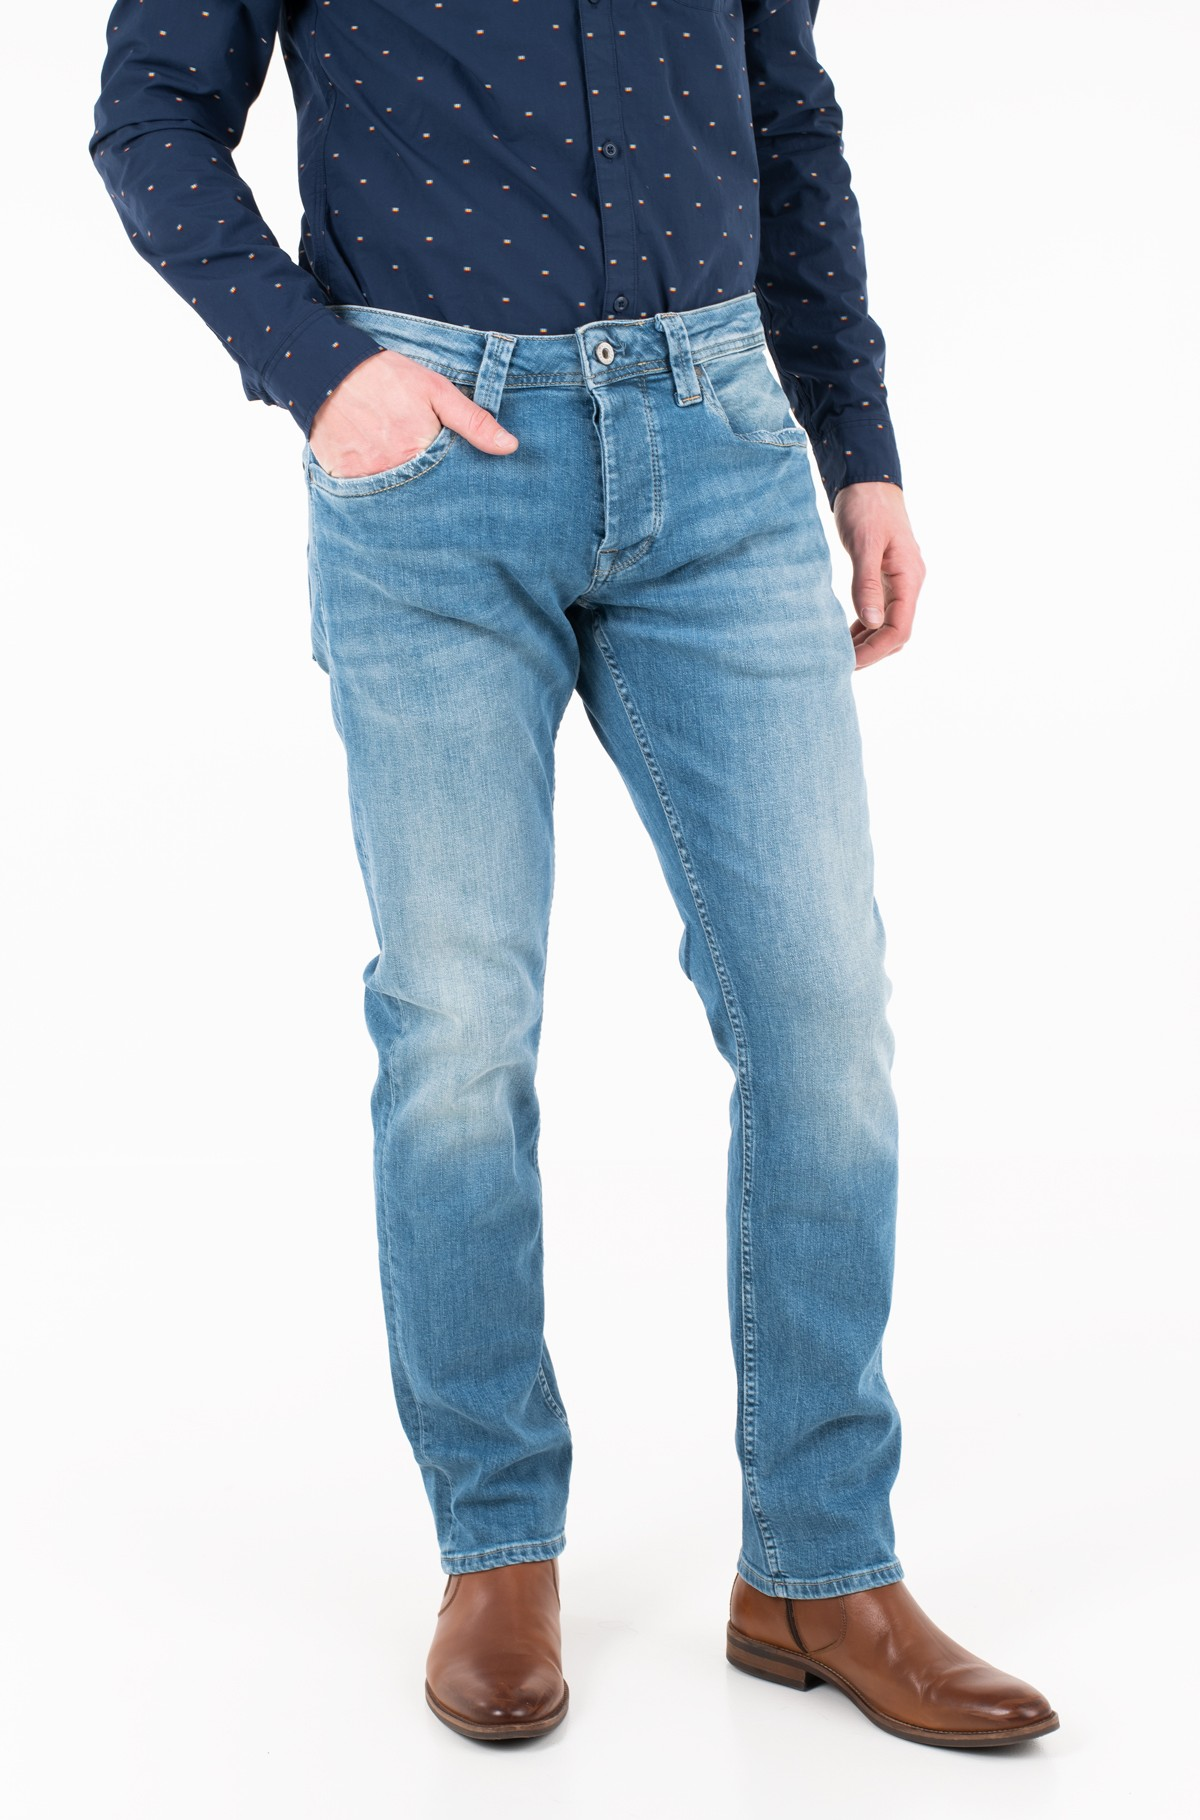 Jeans CASH/PM200124GM5-full-1